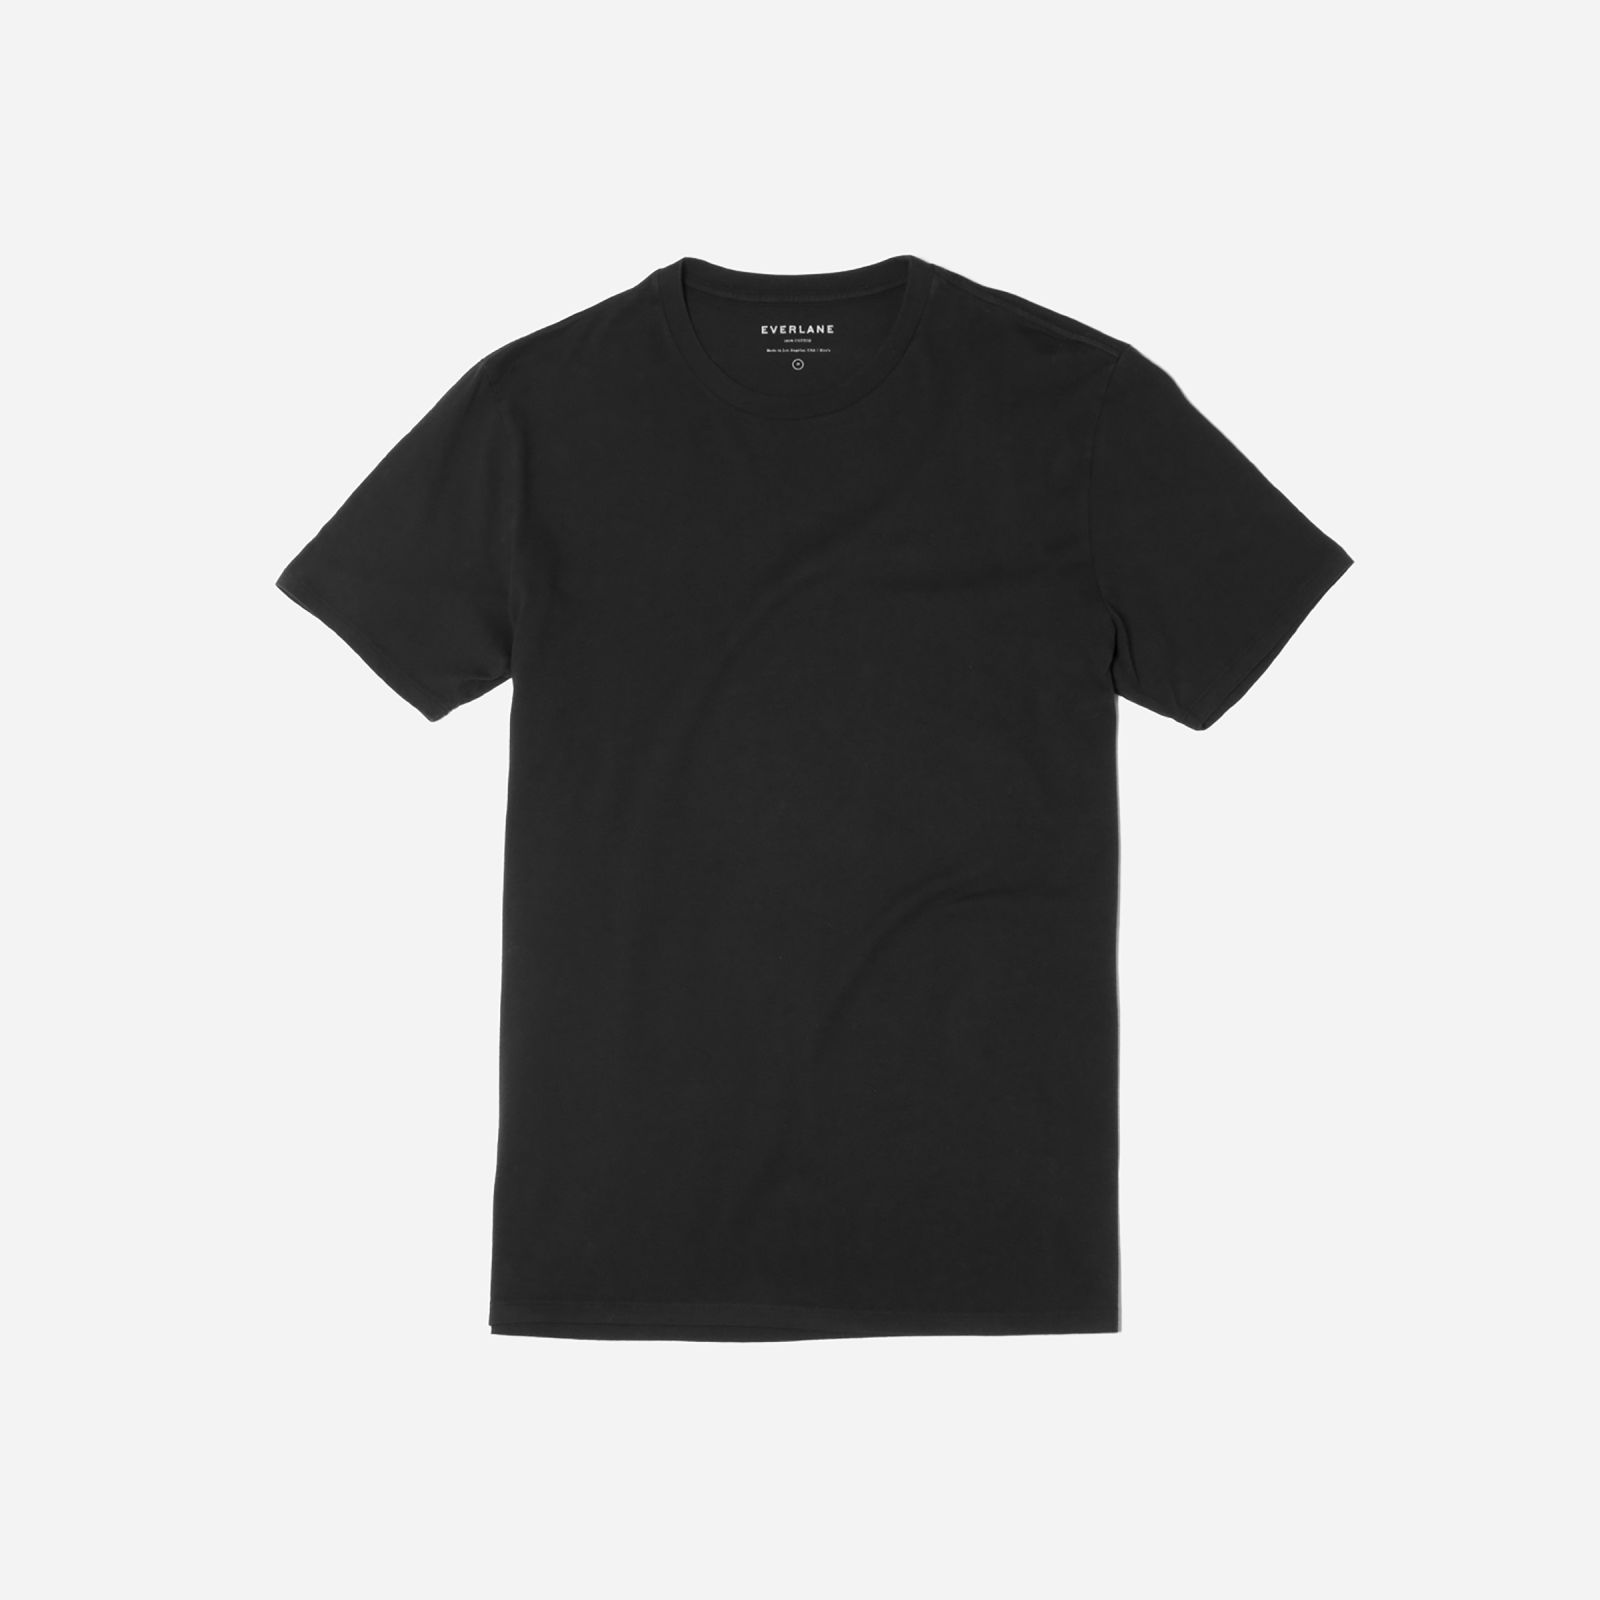 men's cotton crew t-shirt by everlane in true black, size xl